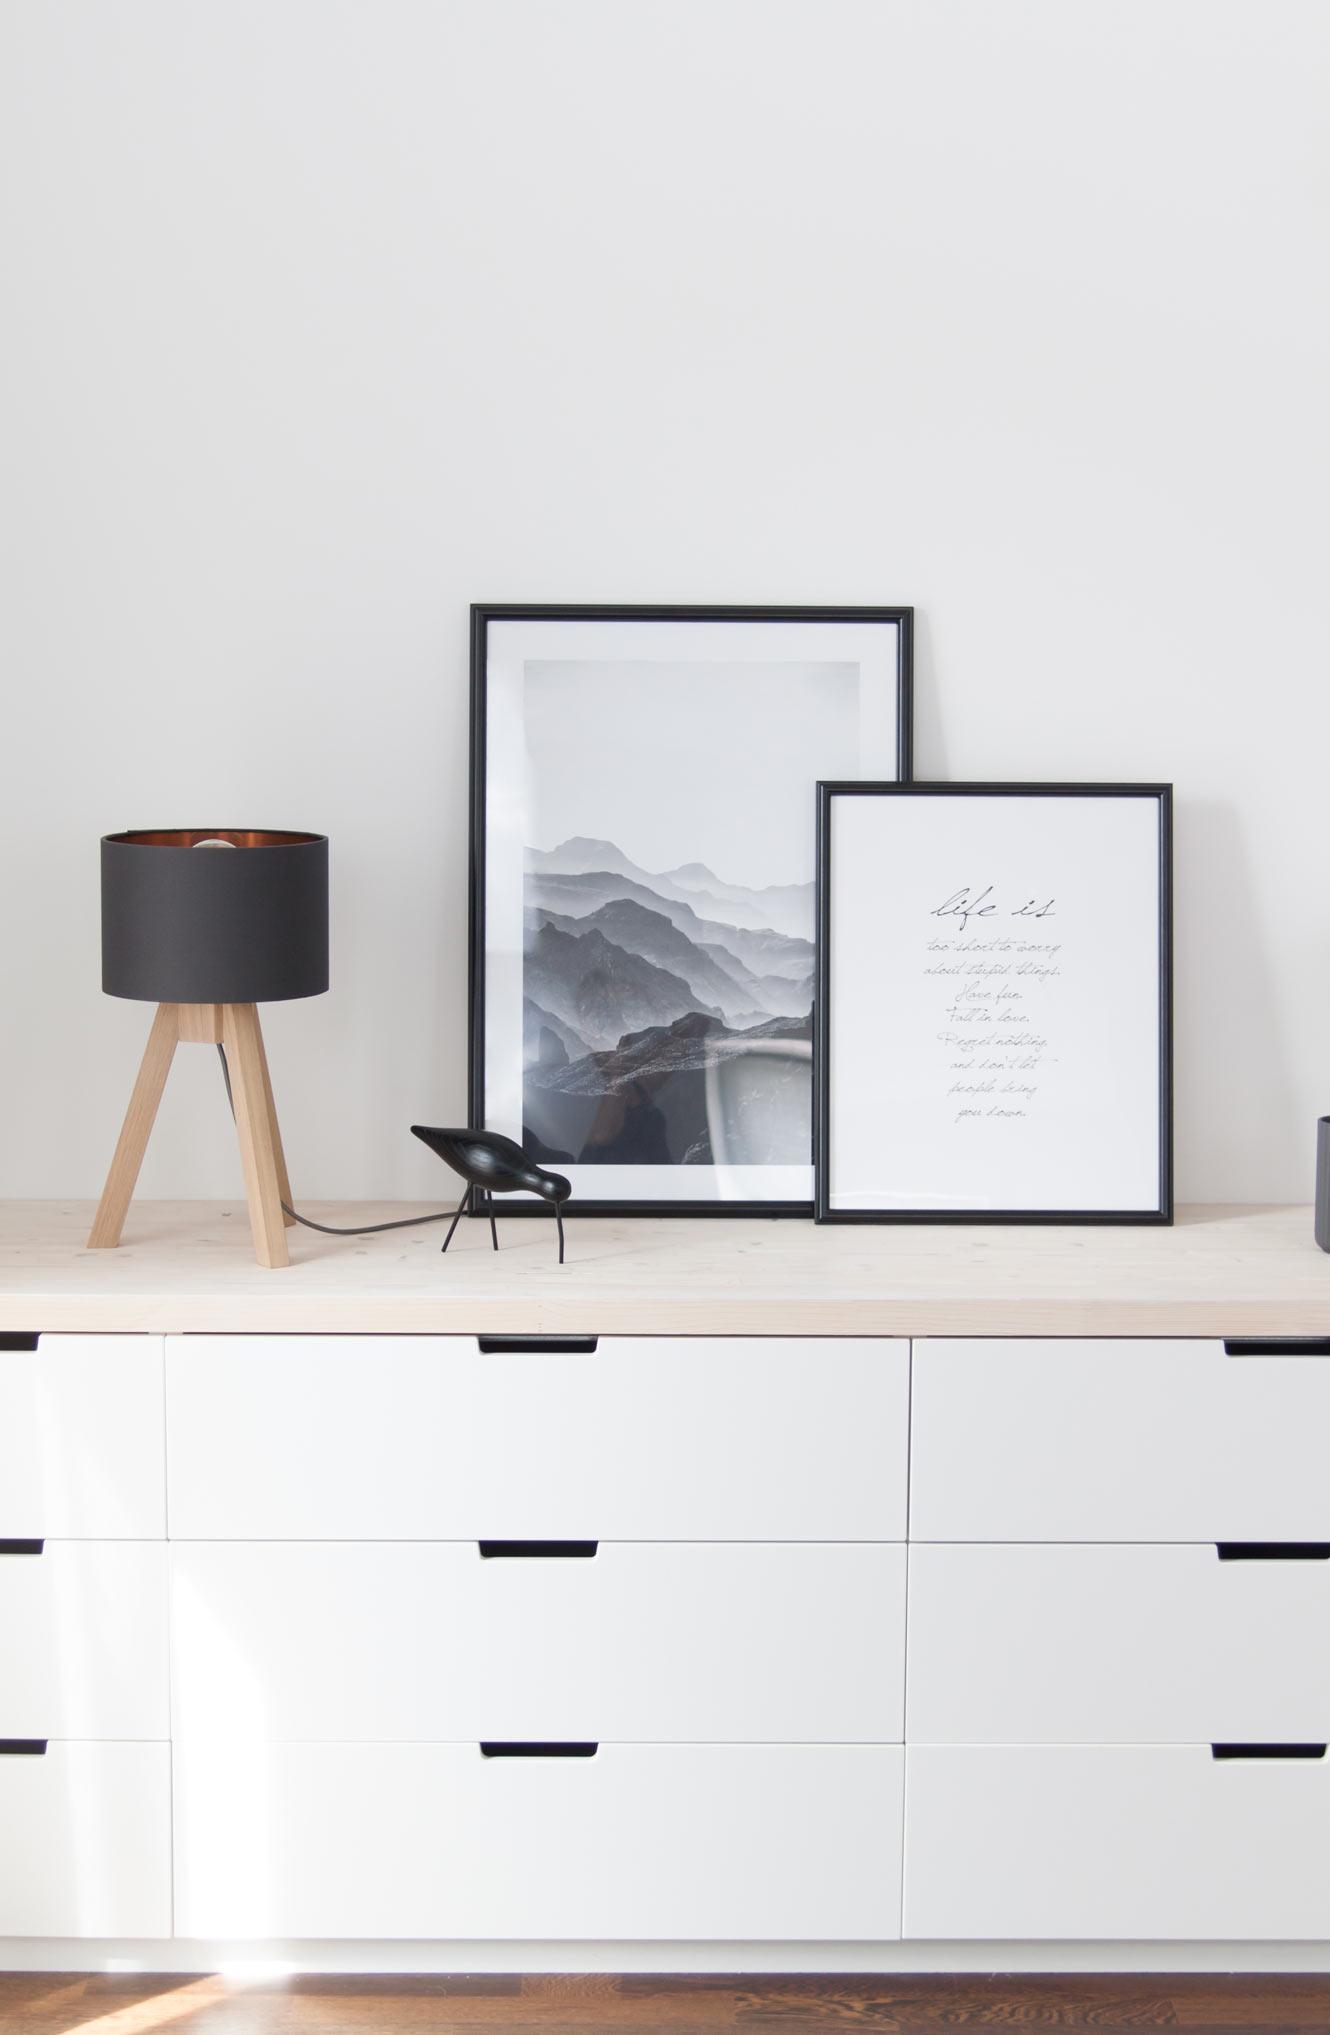 Ikea Nordli Kommode mit Holzplatte DIY